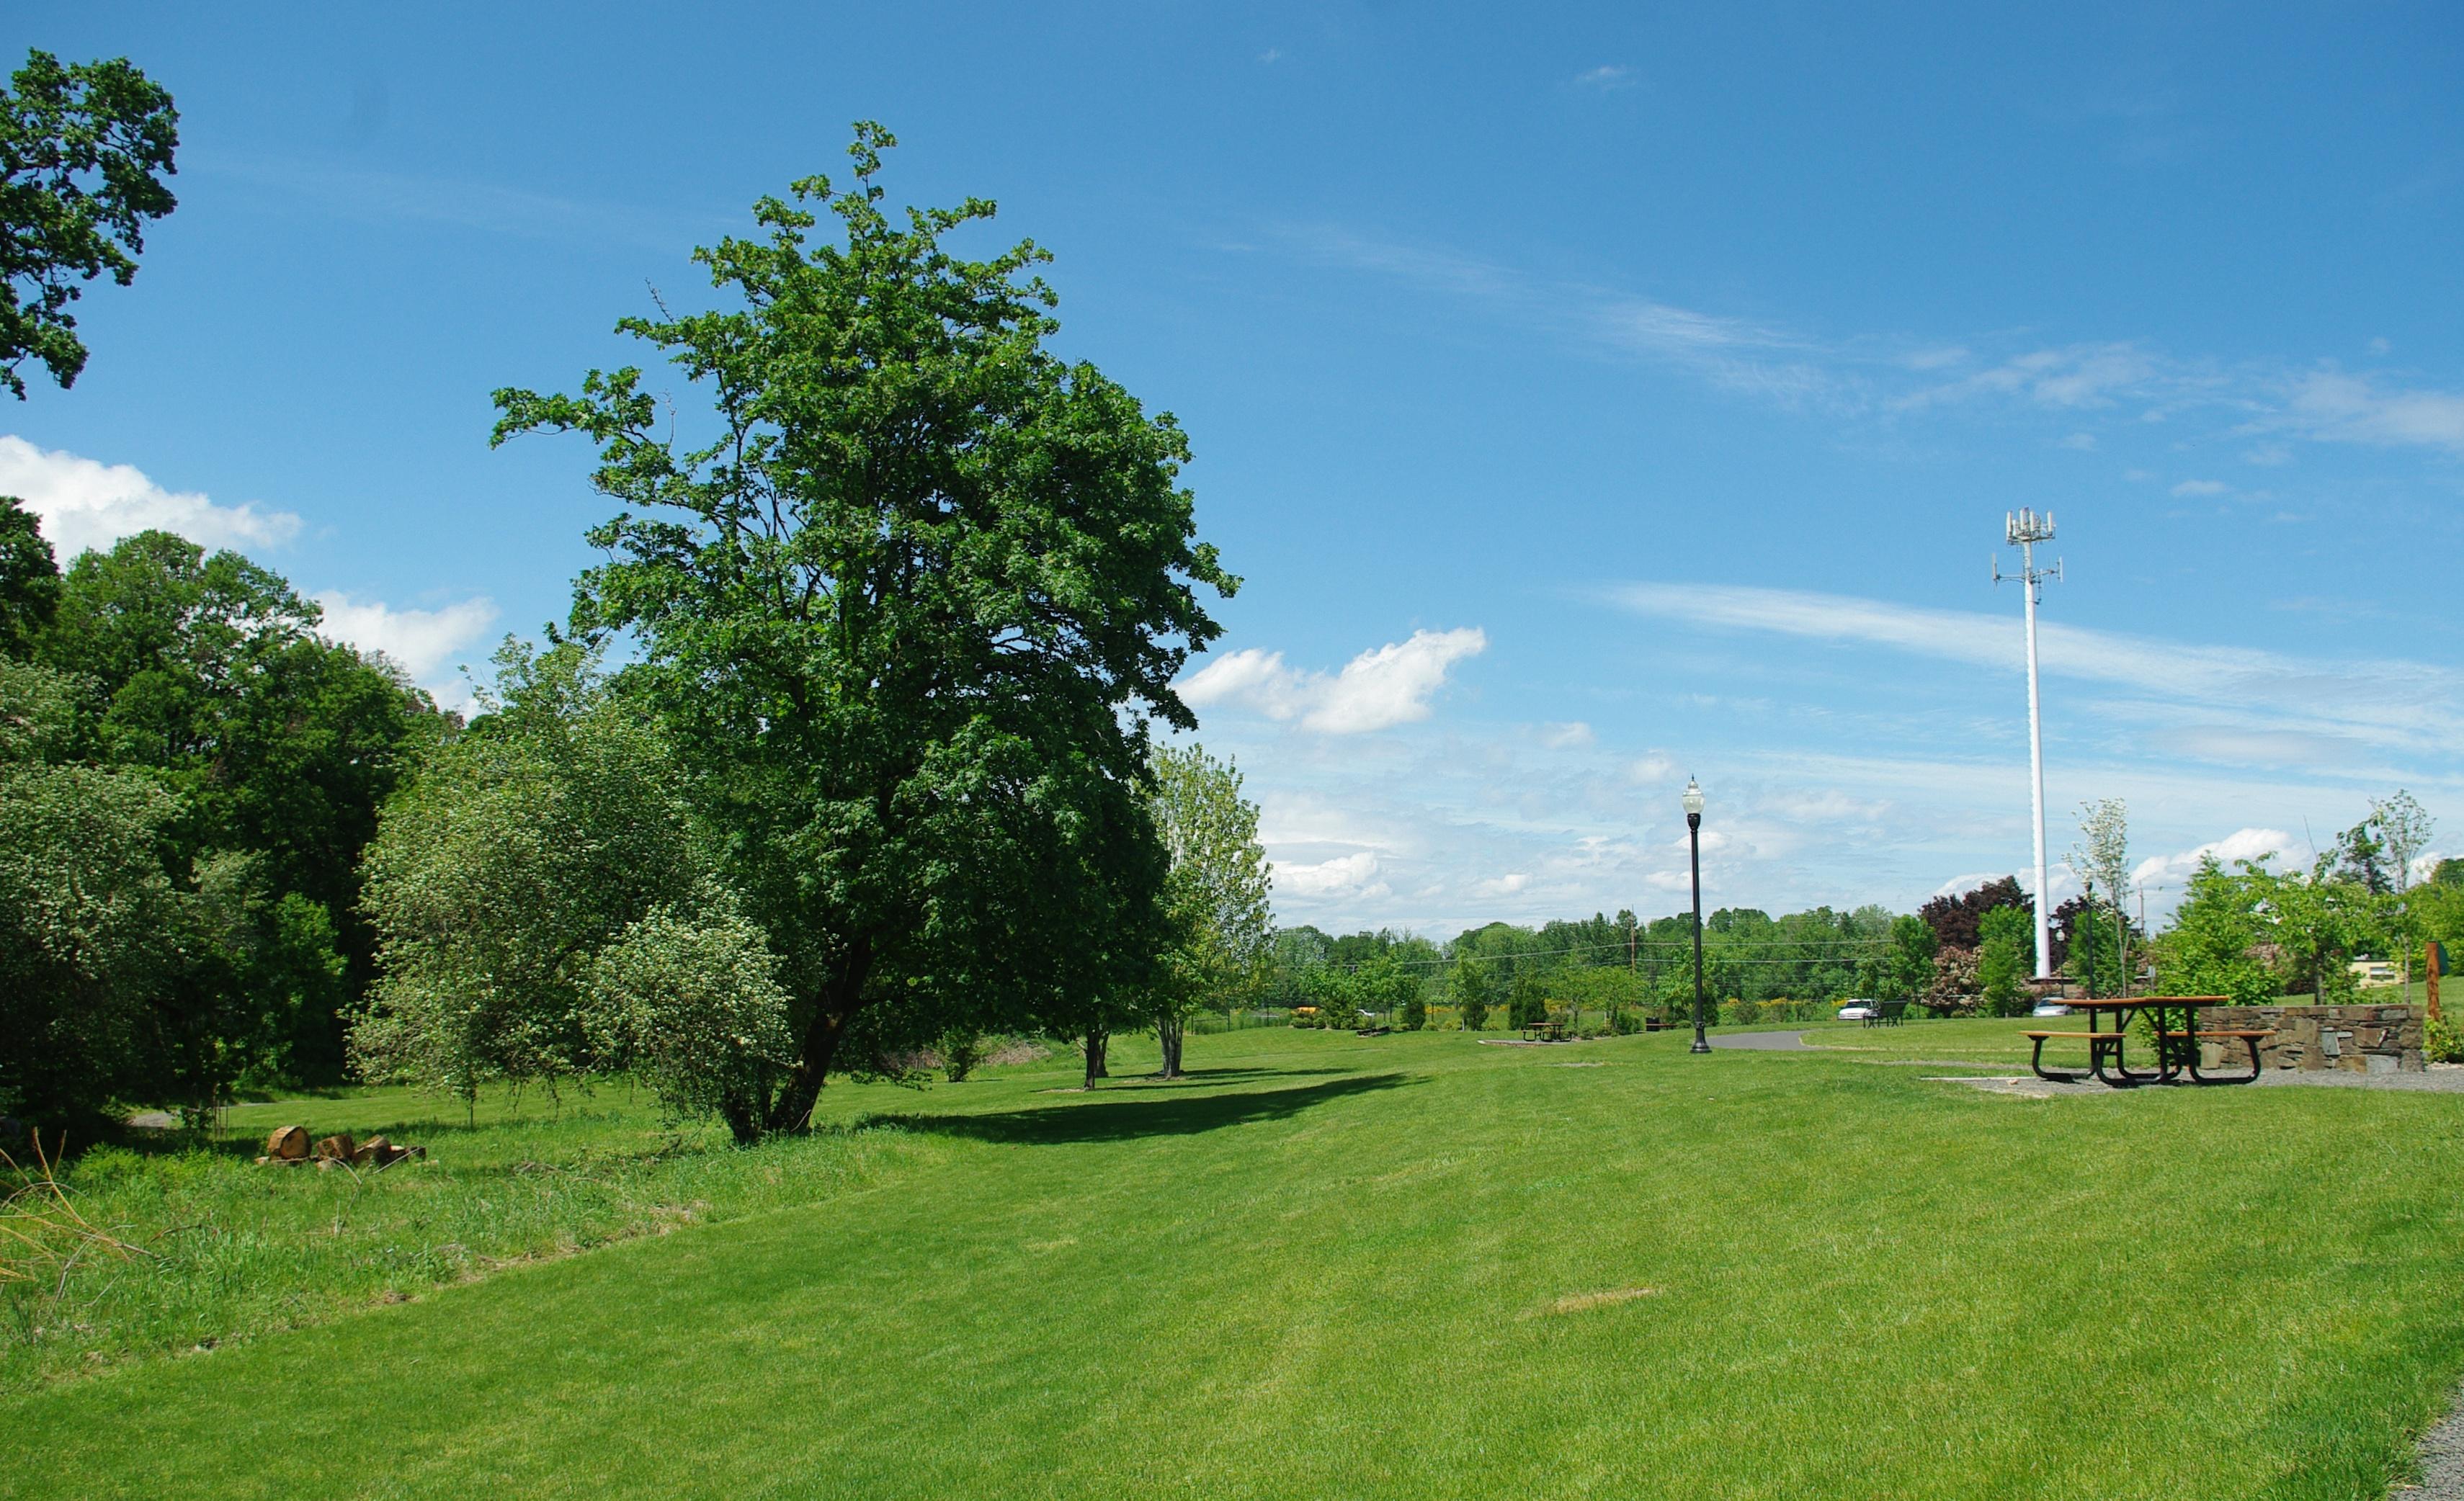 File:Dairy Creek Park Hillsboro Oregon trees.JPG - Wikimedia Commons